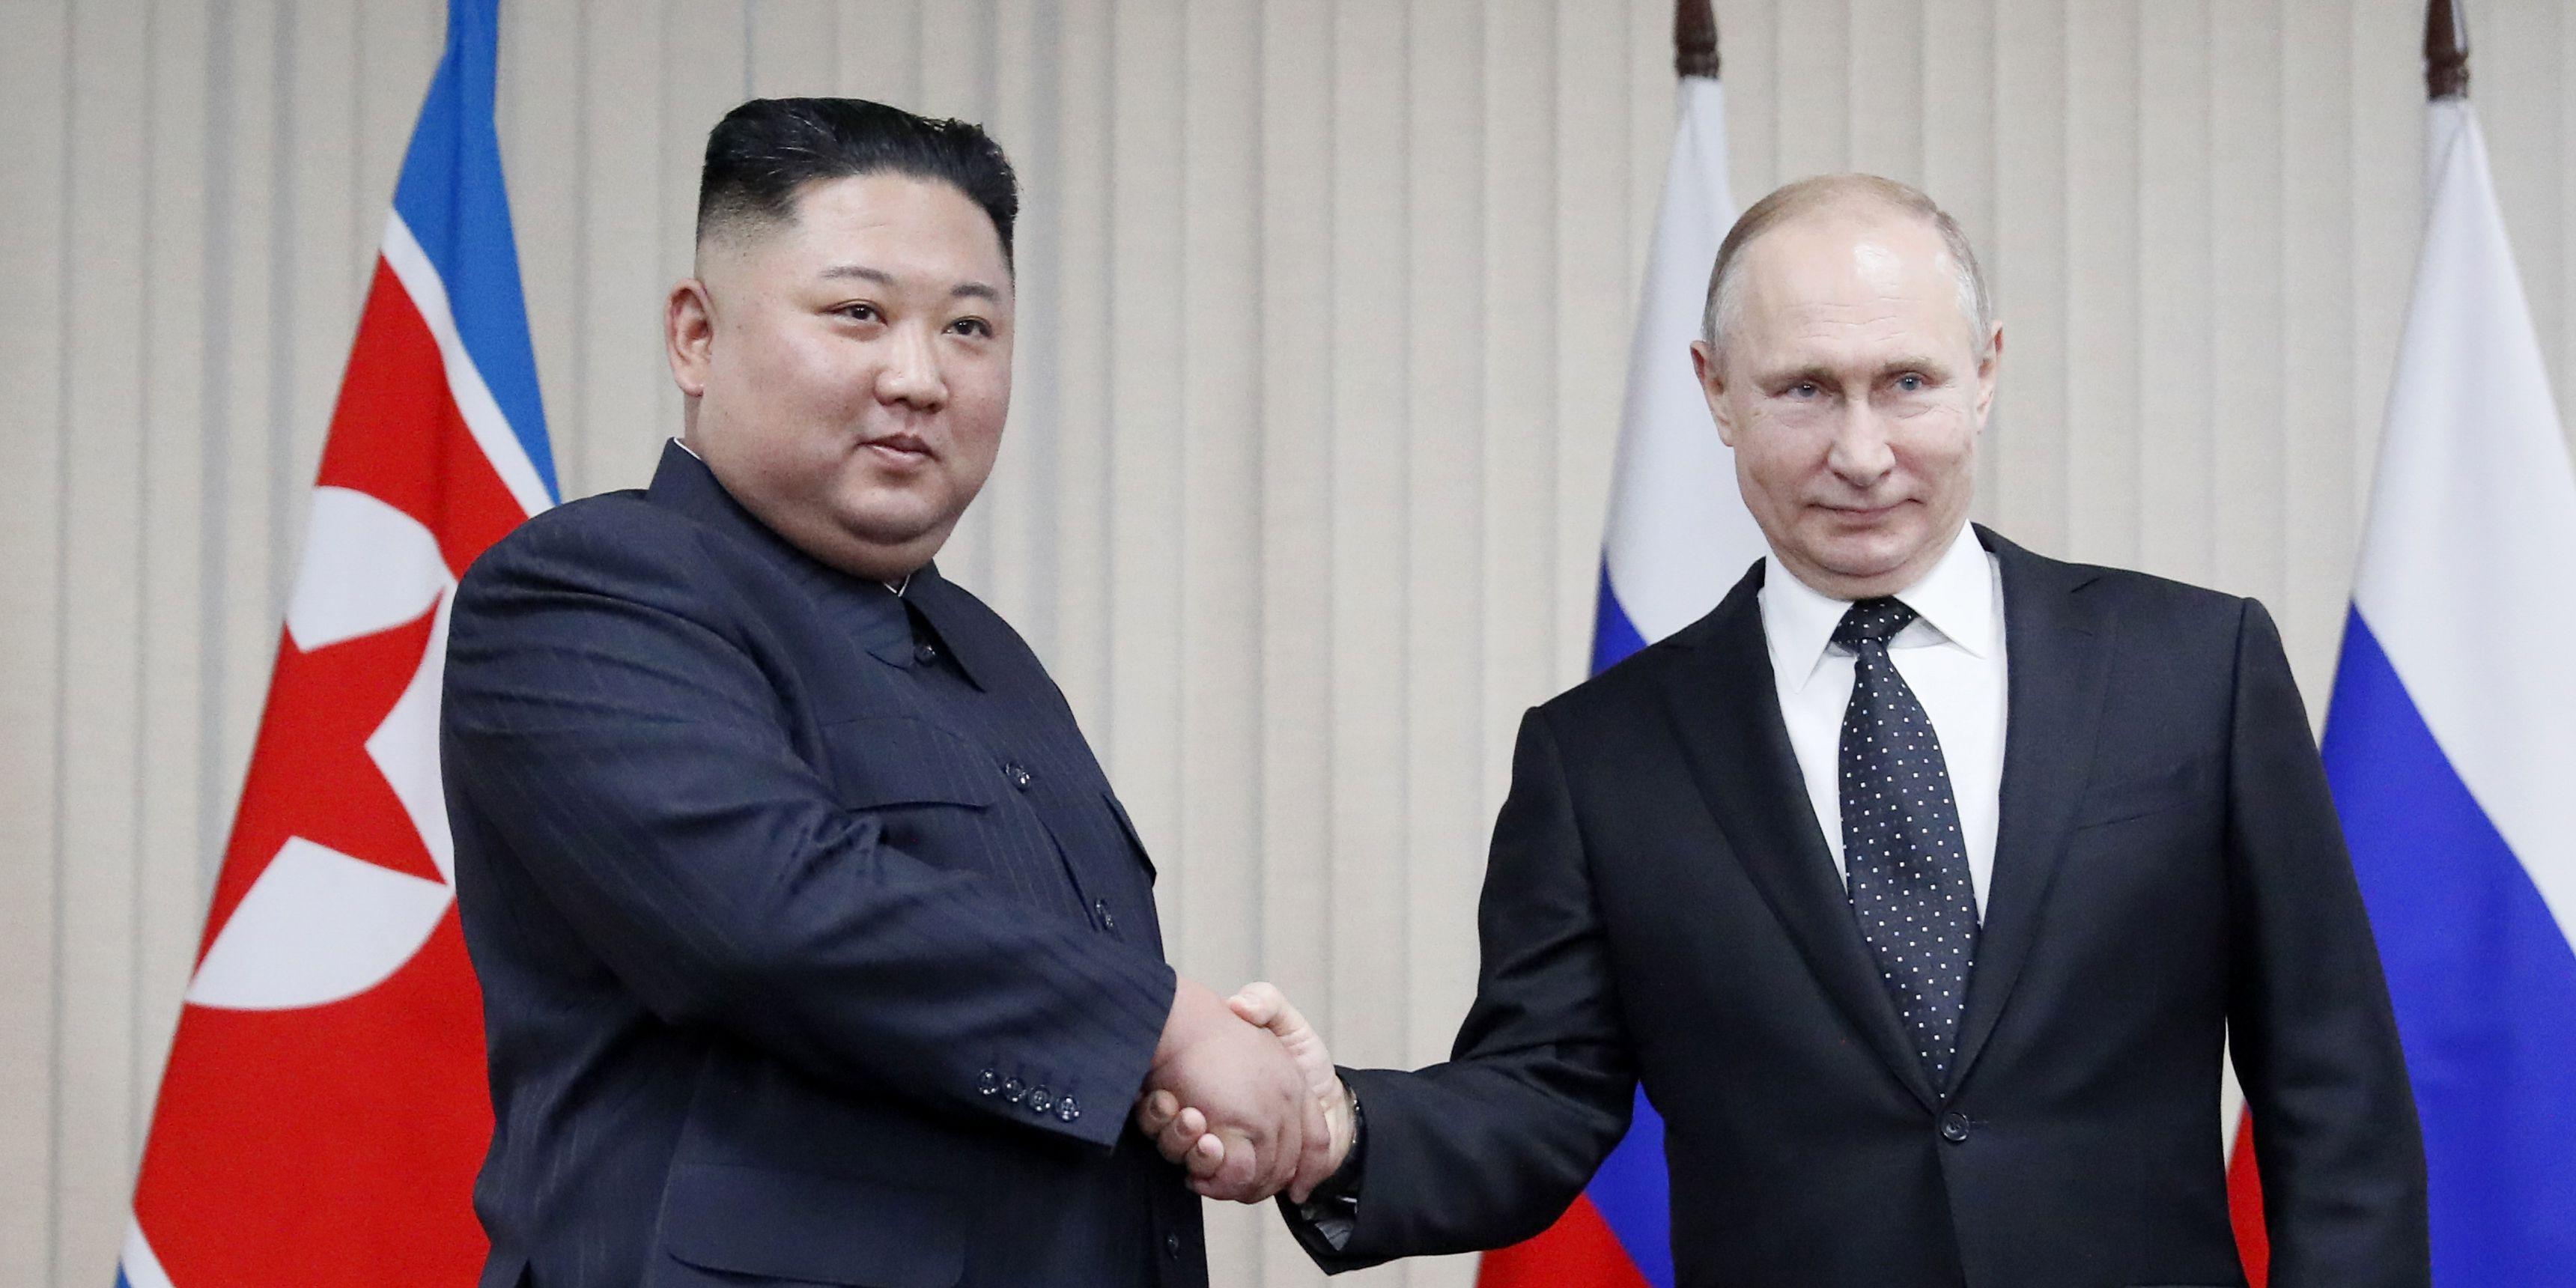 Putin says he'll brief US on summit with Kim